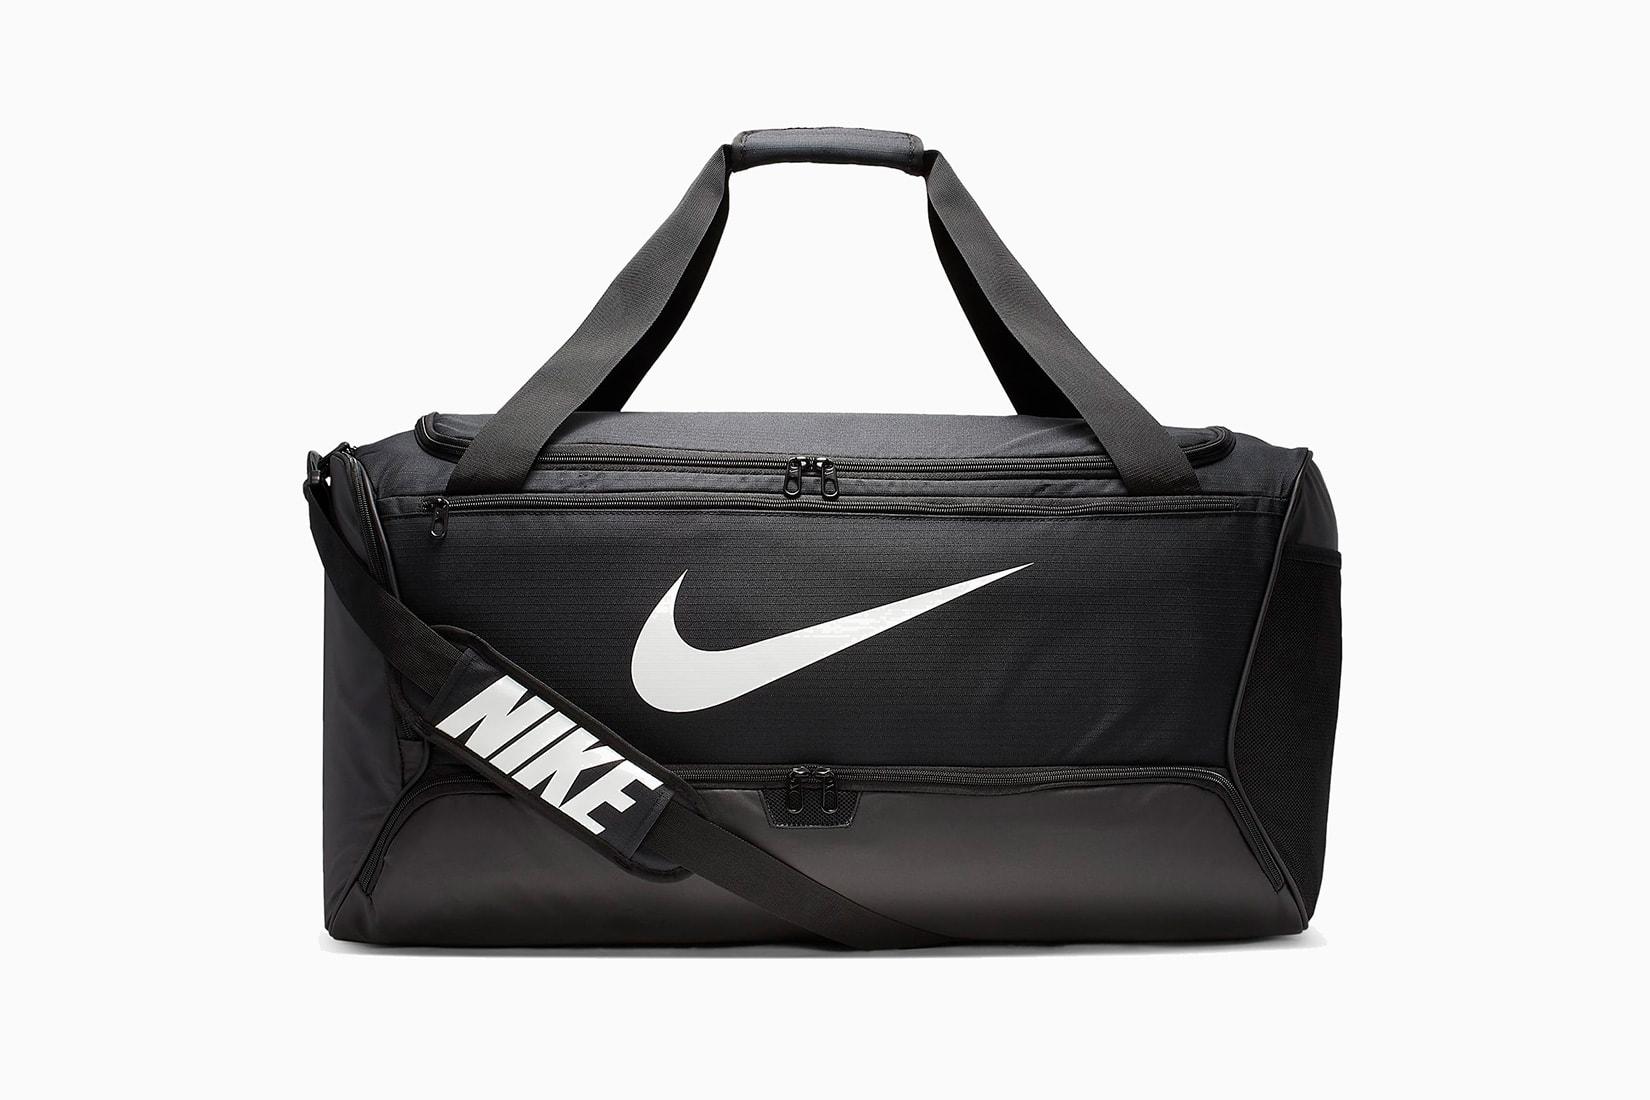 best men gym bag nike brasilia duffel review - Luxe Digital